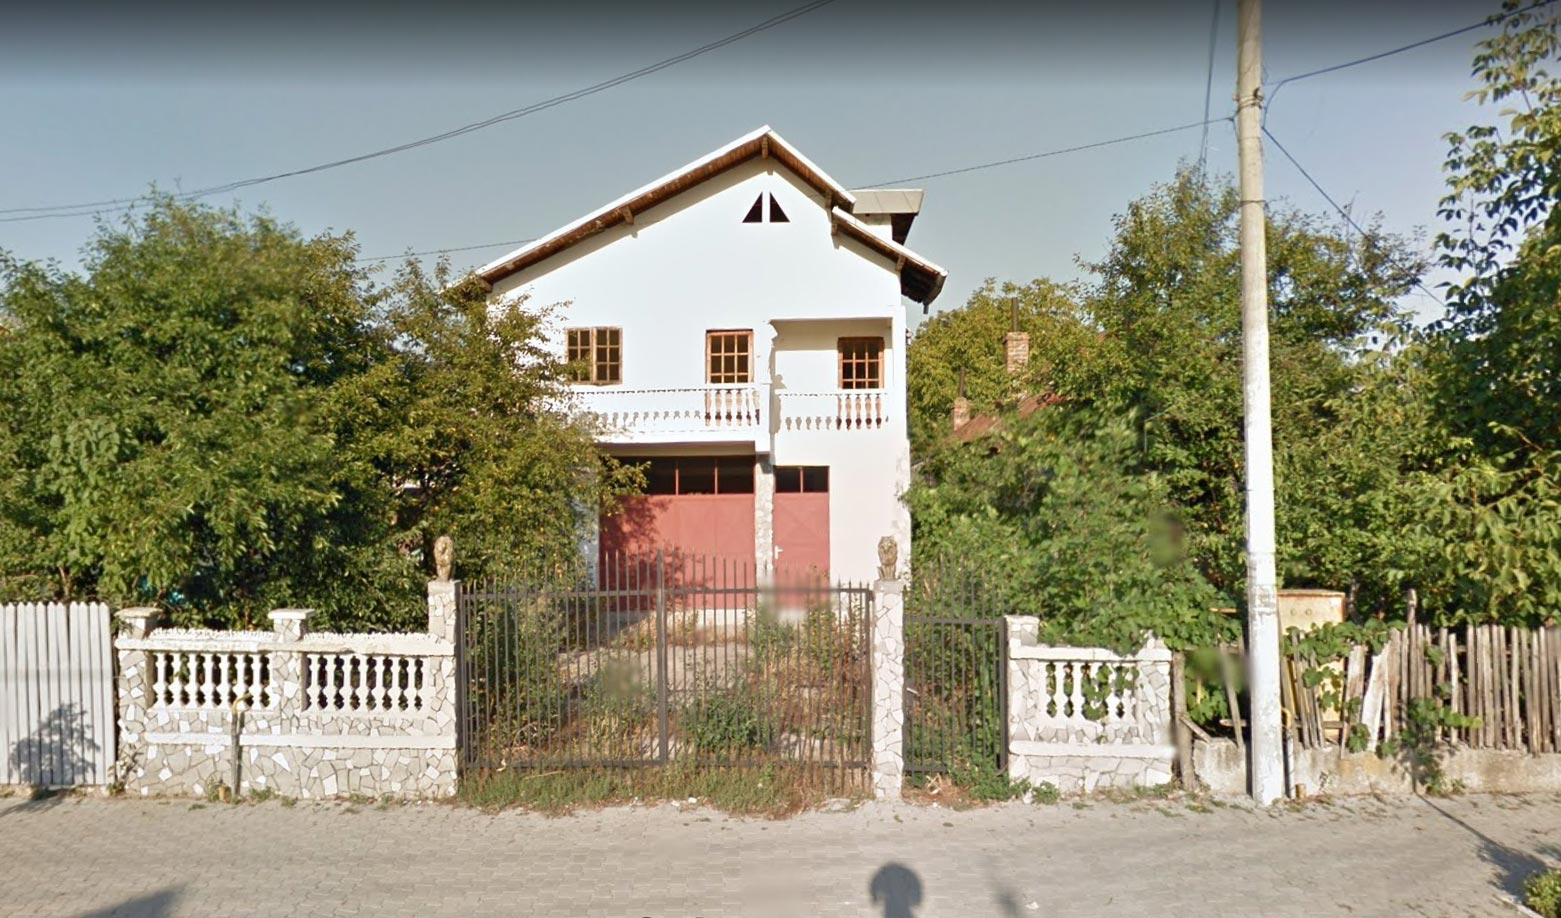 Casa P+E 174,20mp + teren intravilan 526mp, Urlati, jud. Prahova